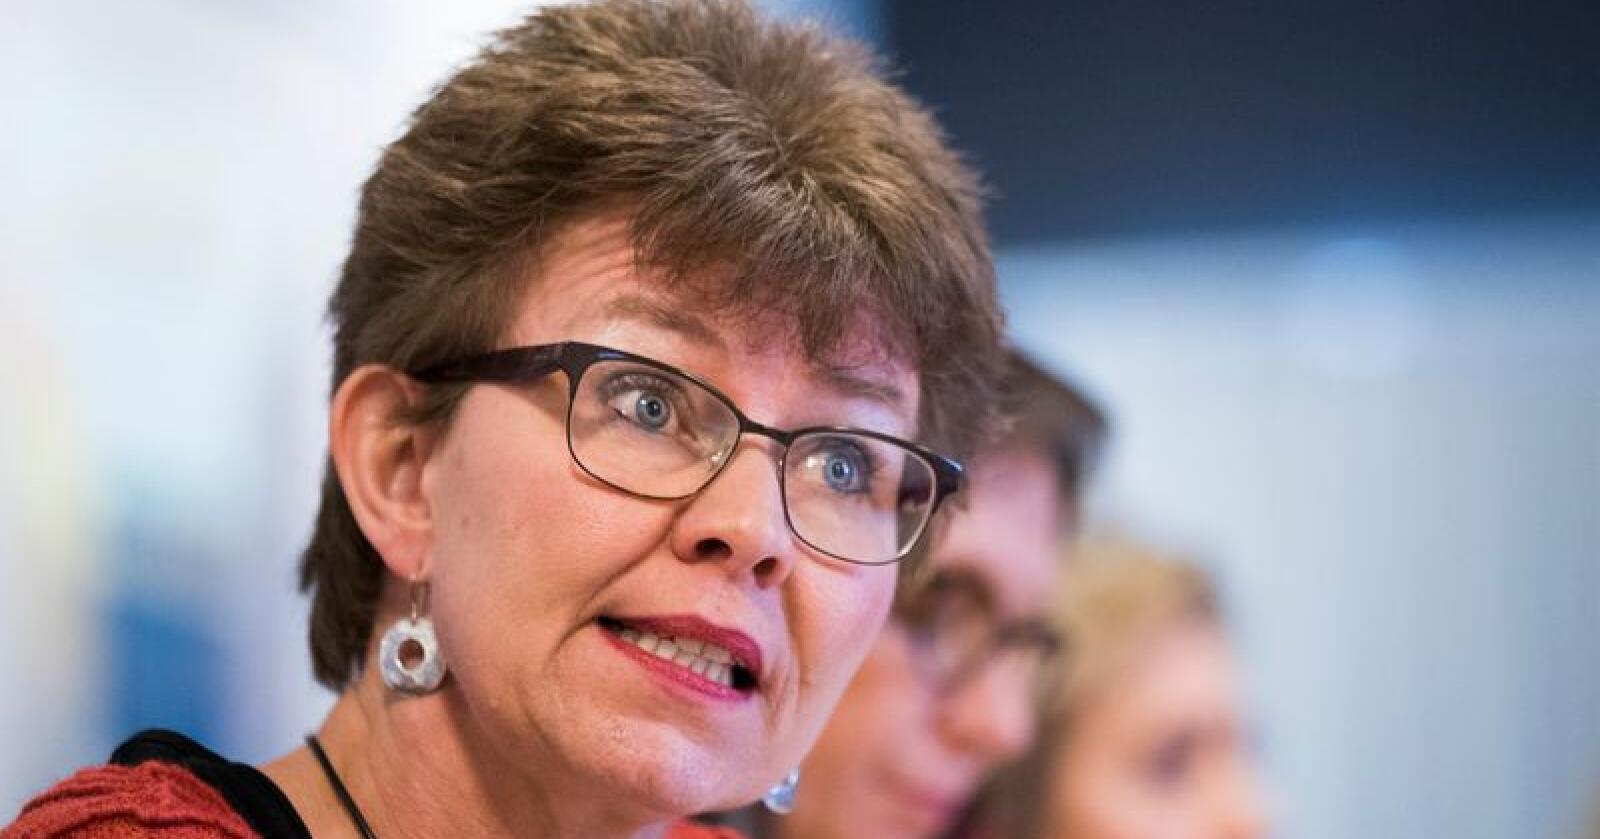 Kathrine Kleveland er leder i Nei til EU. Foto: Håkon Mosvold Larsen / NTB scanpix